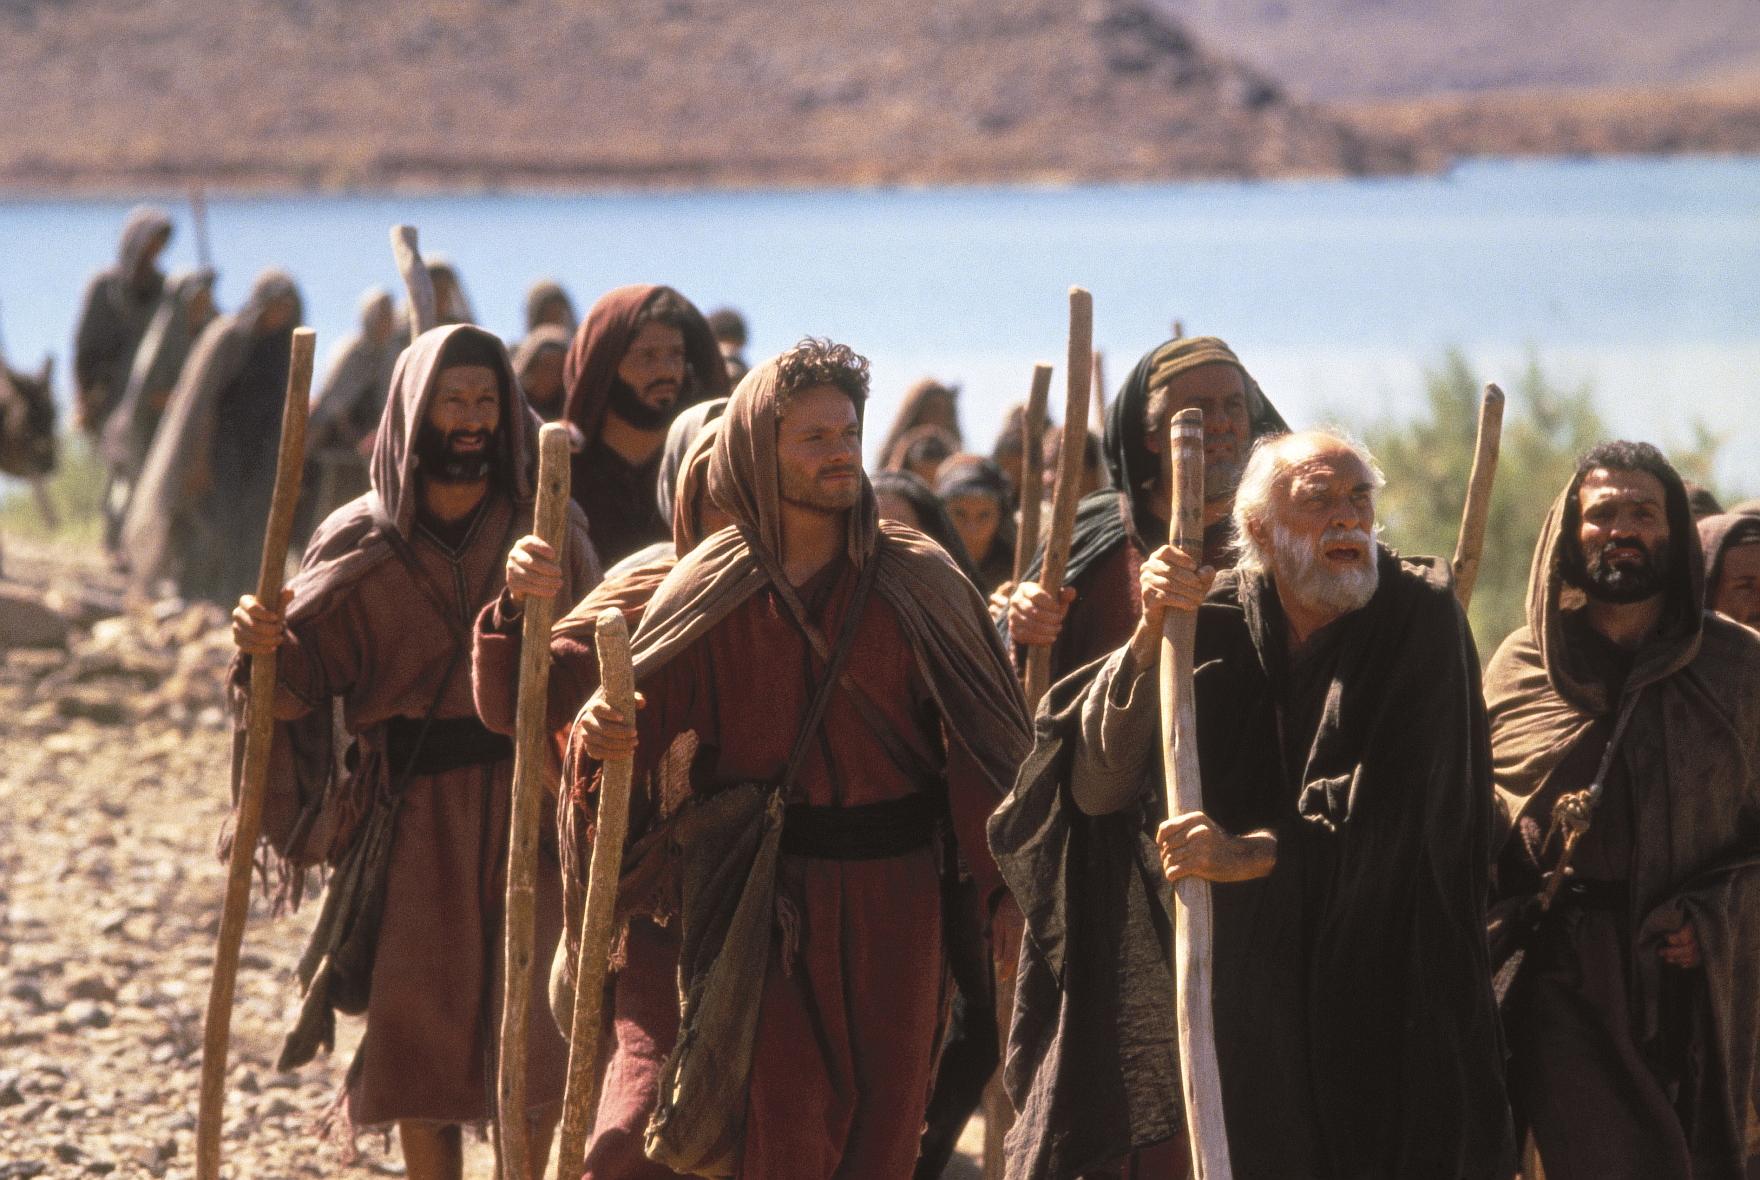 THE BIBLE - JOSEPH (14)